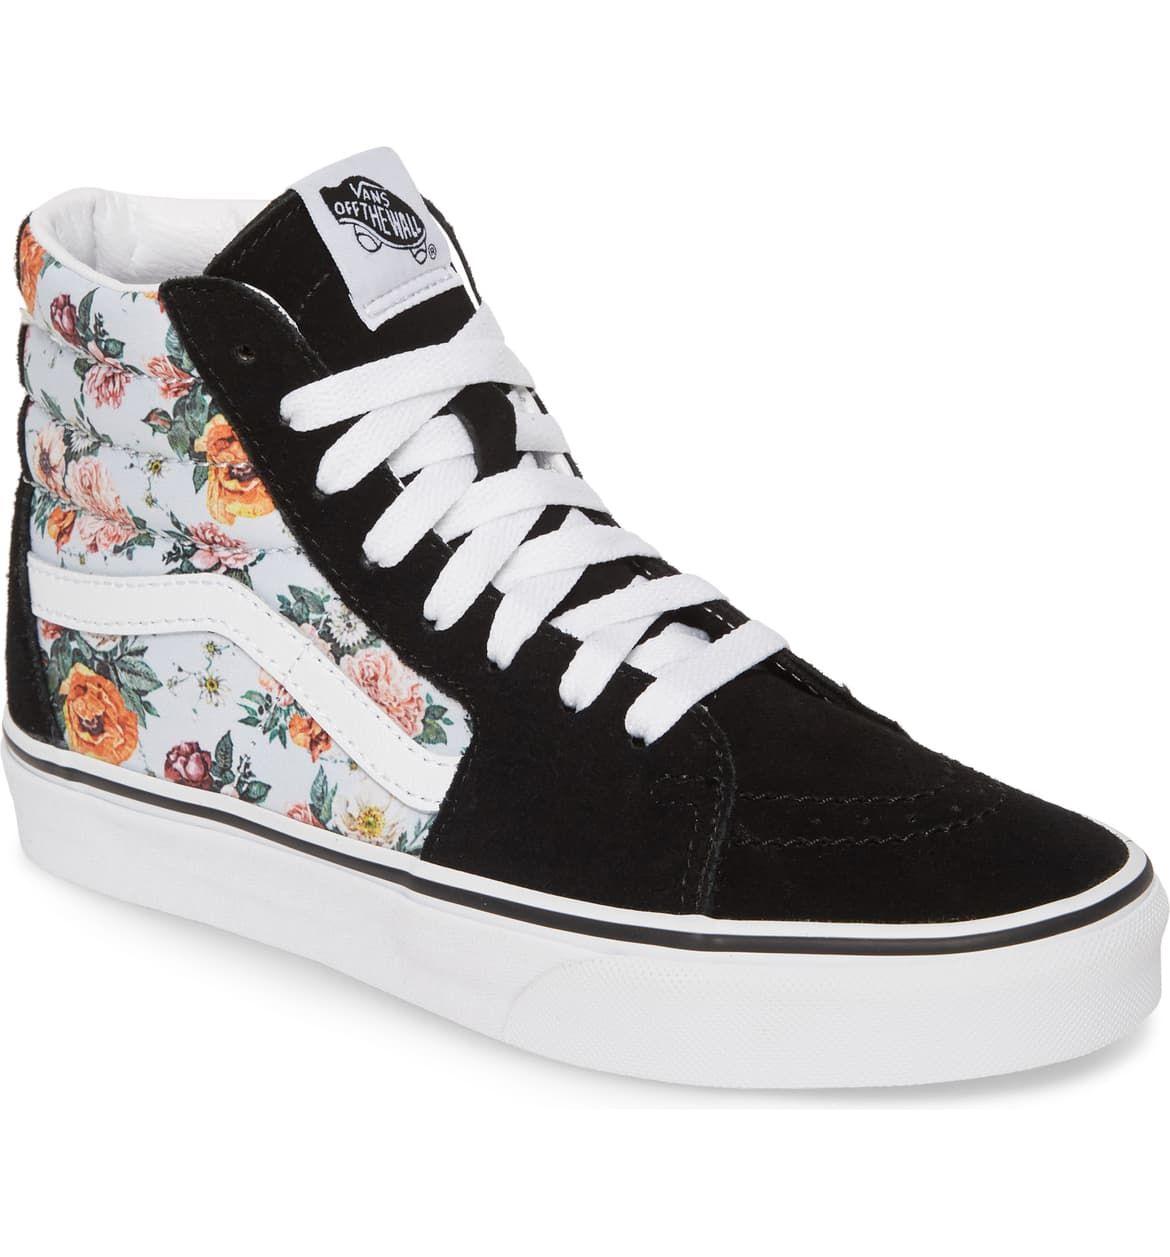 Vans Sk8-Hi Checker Floral High Top Sneaker (Women)   Nordstrom ...